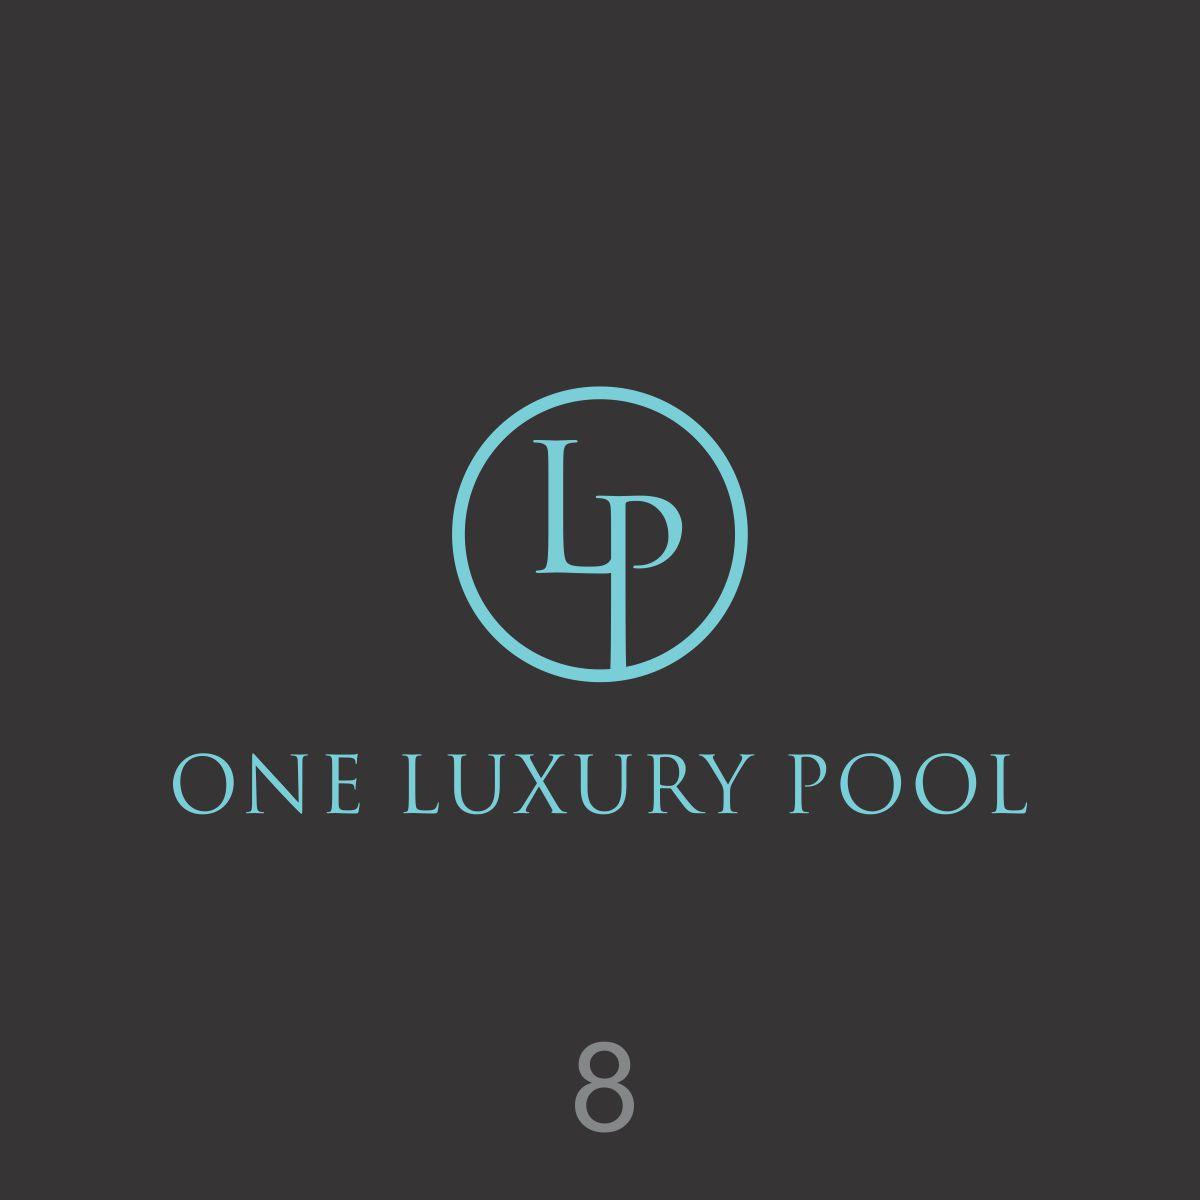 One Luxury Pool